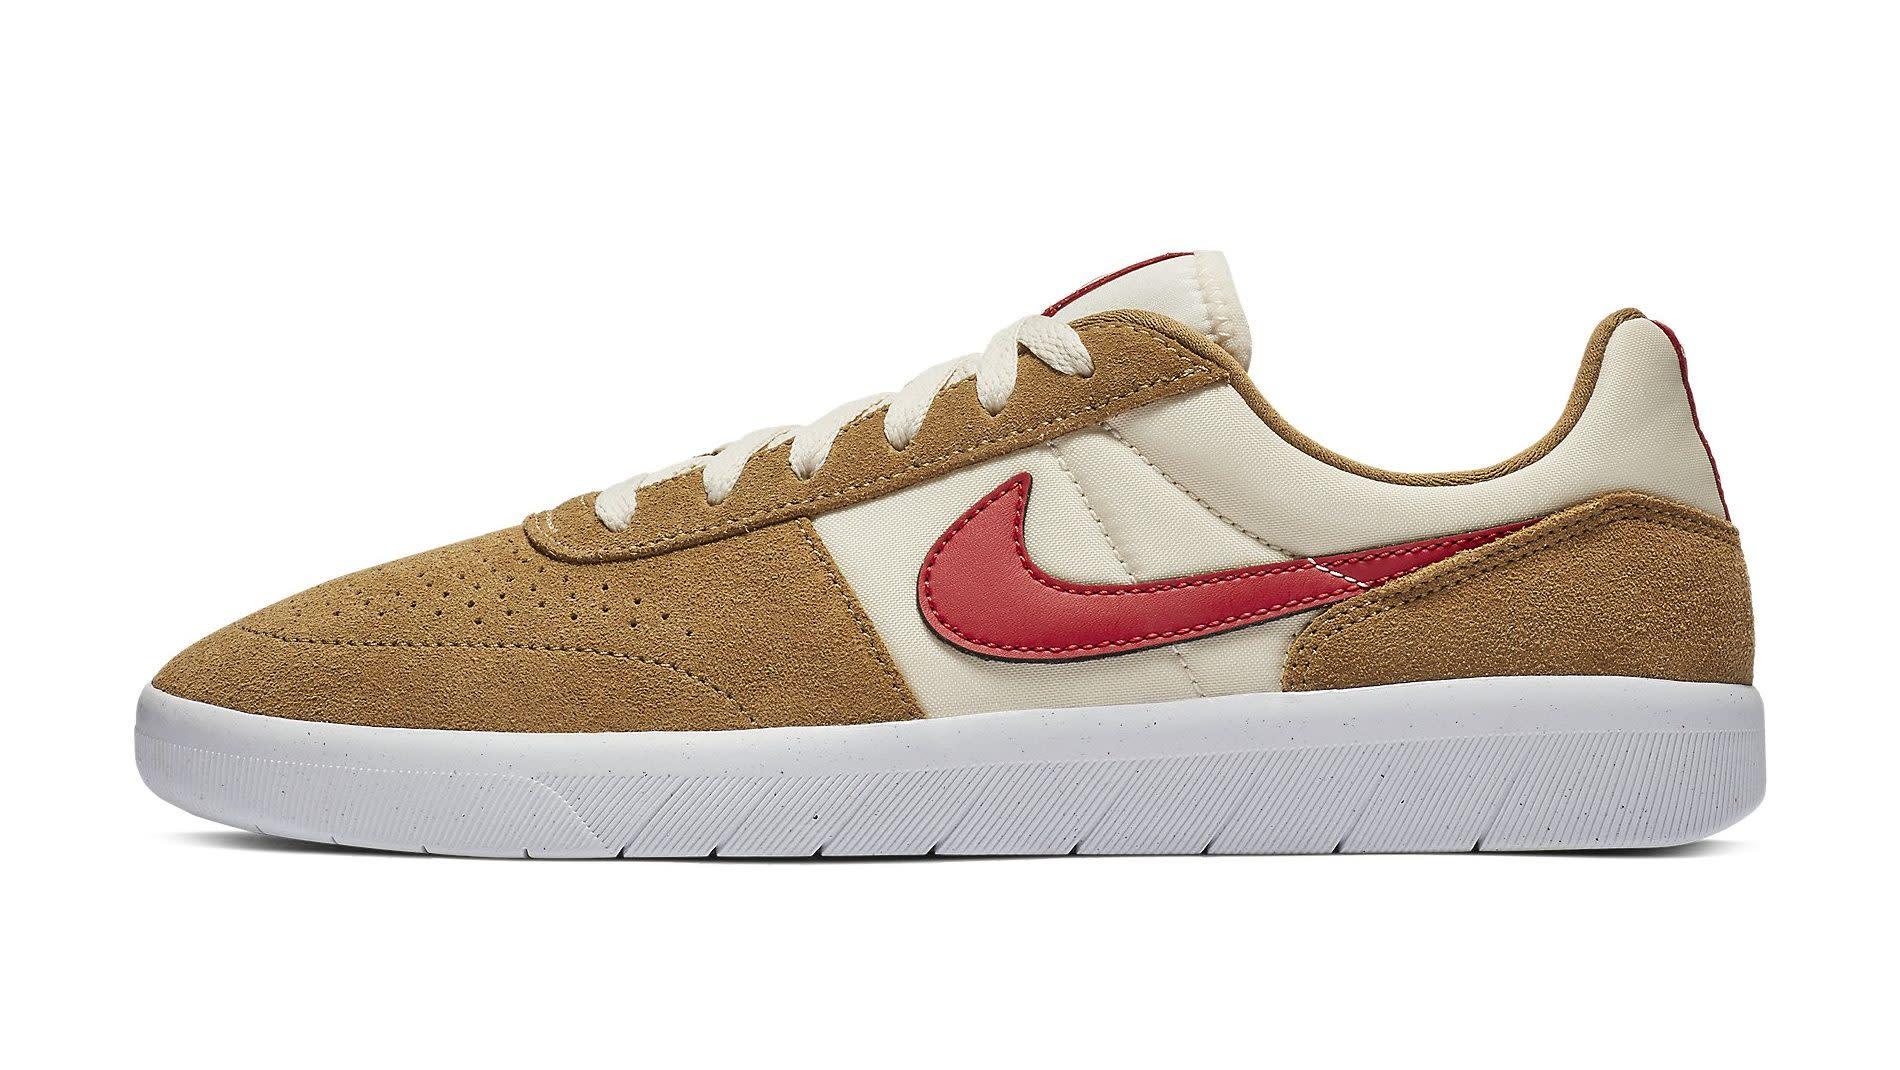 You Can Now Buy This Tom Sachs X Nike Mars Yard 2 0 Look Alike Skate